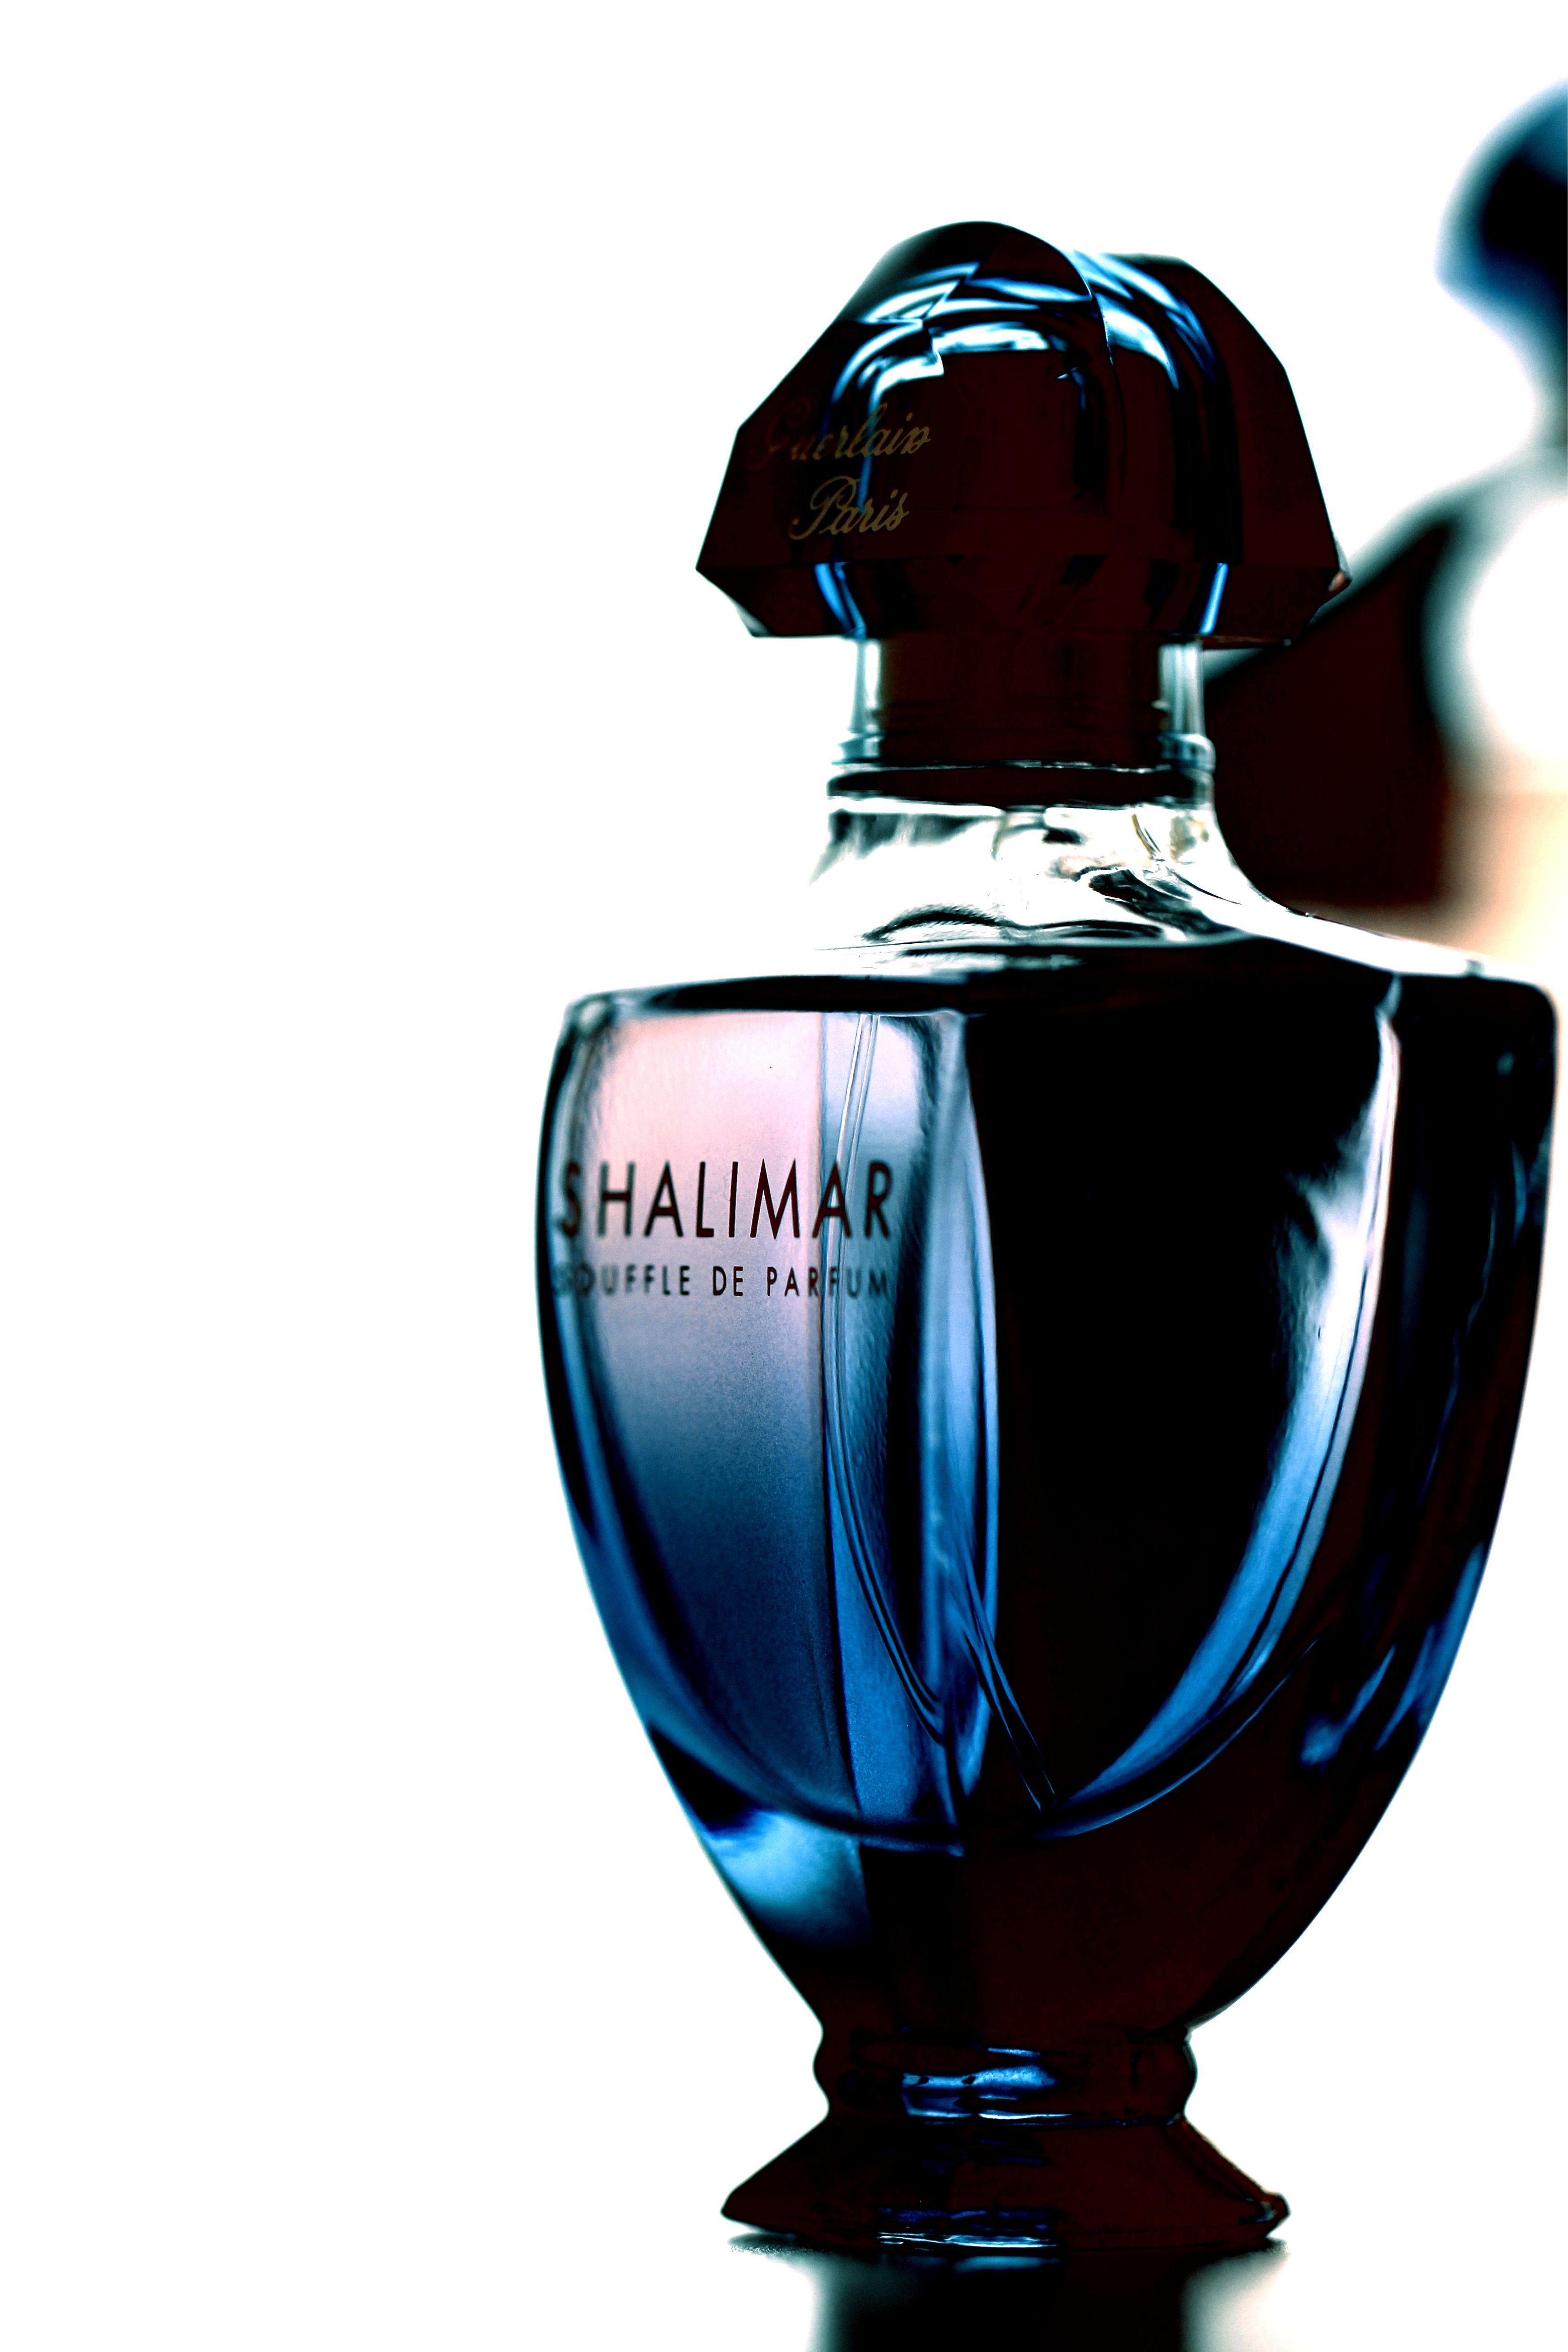 Femme Parfum Parfum Casting Parfum Casting Parfum De De Casting Casting De Femme Femme Y7vfbg6Iy